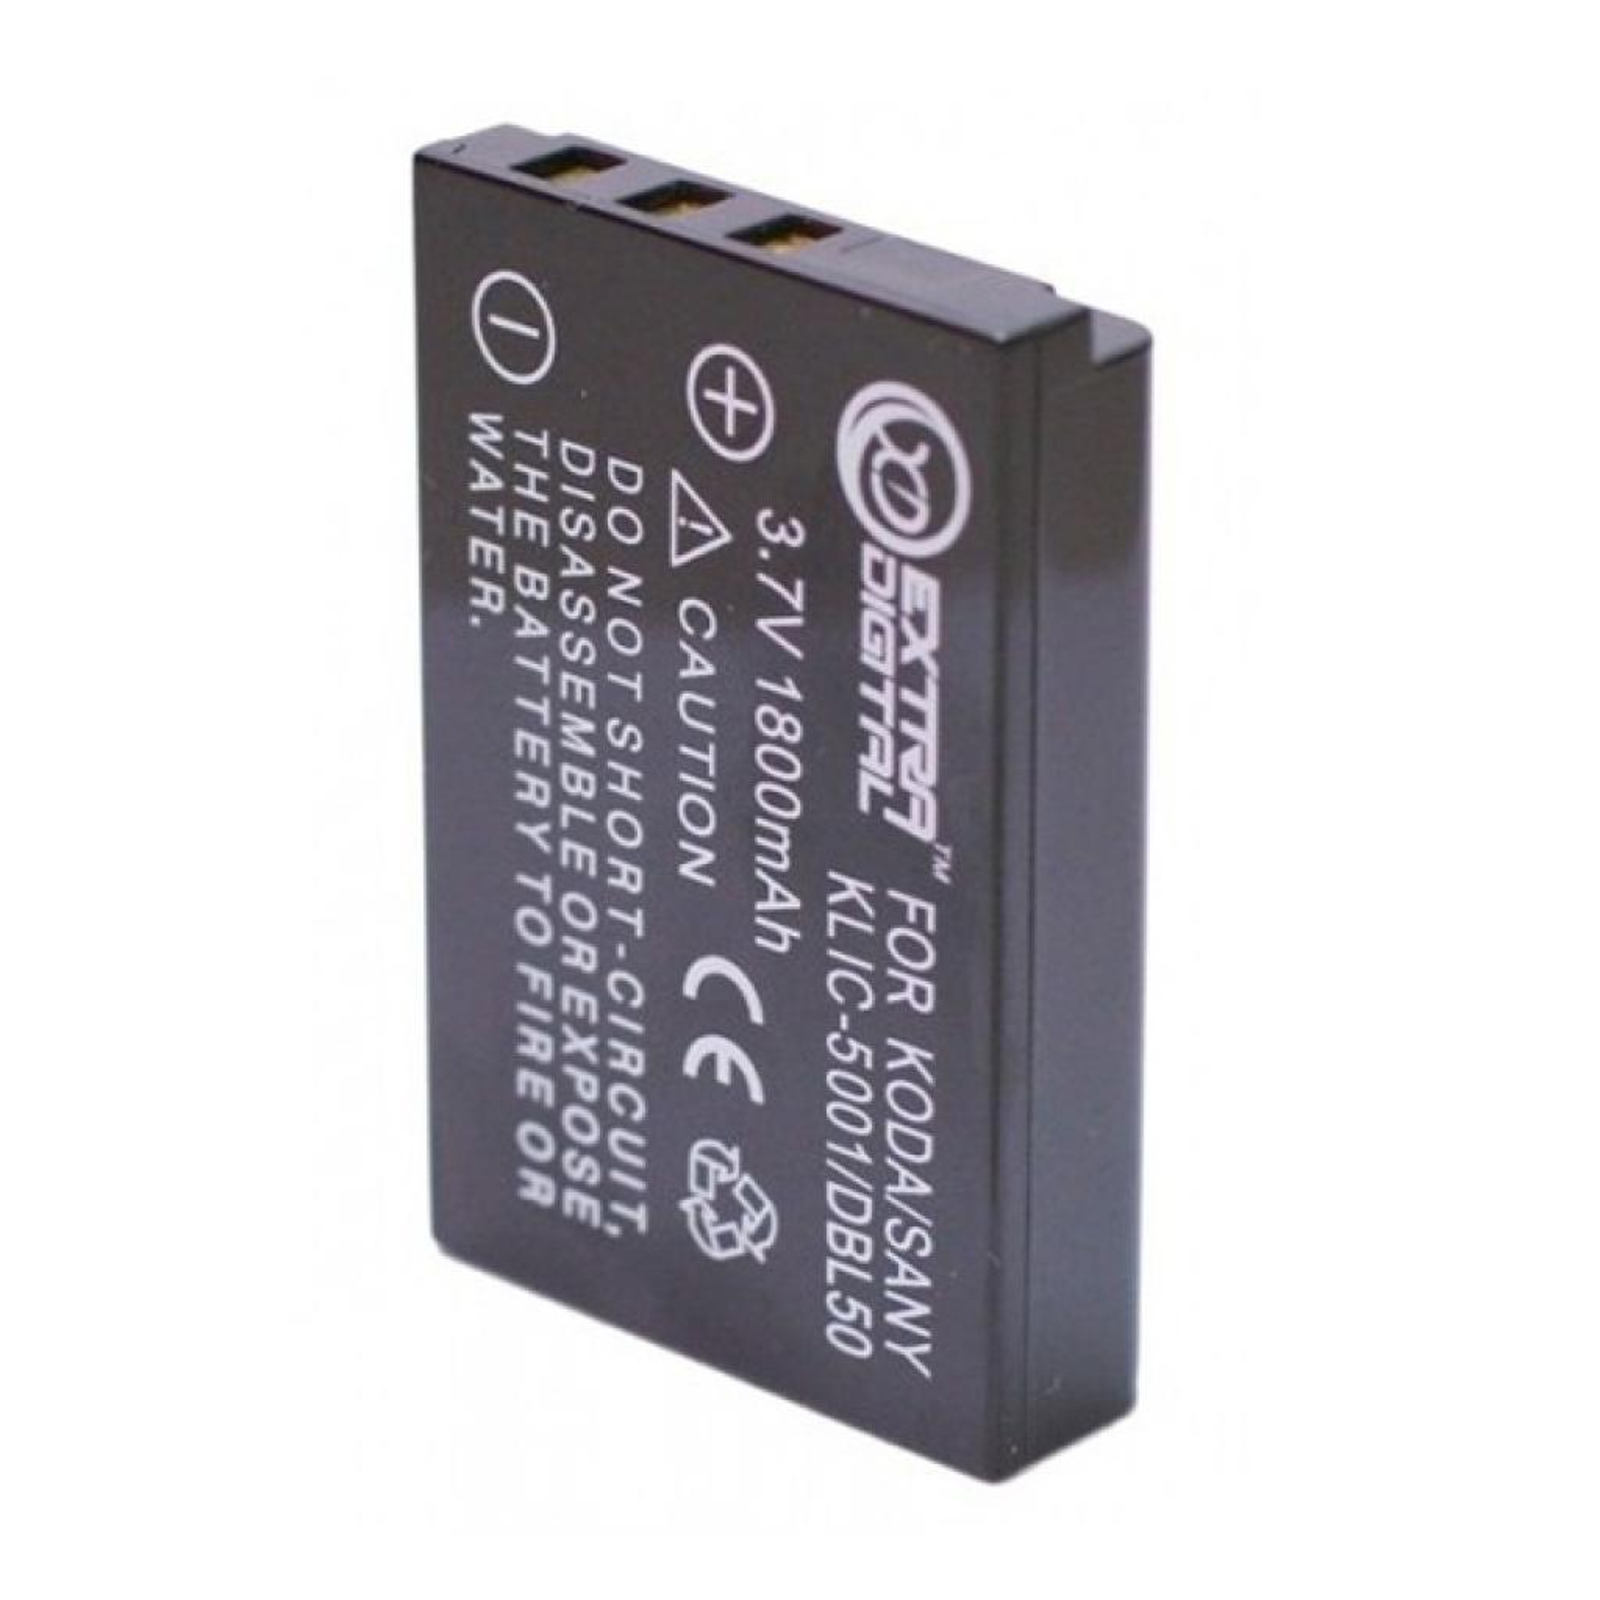 Аккумулятор к фото/видео EXTRADIGITAL Kodak KLIC-5001, DB-L50 (DV00DV1151) изображение 2